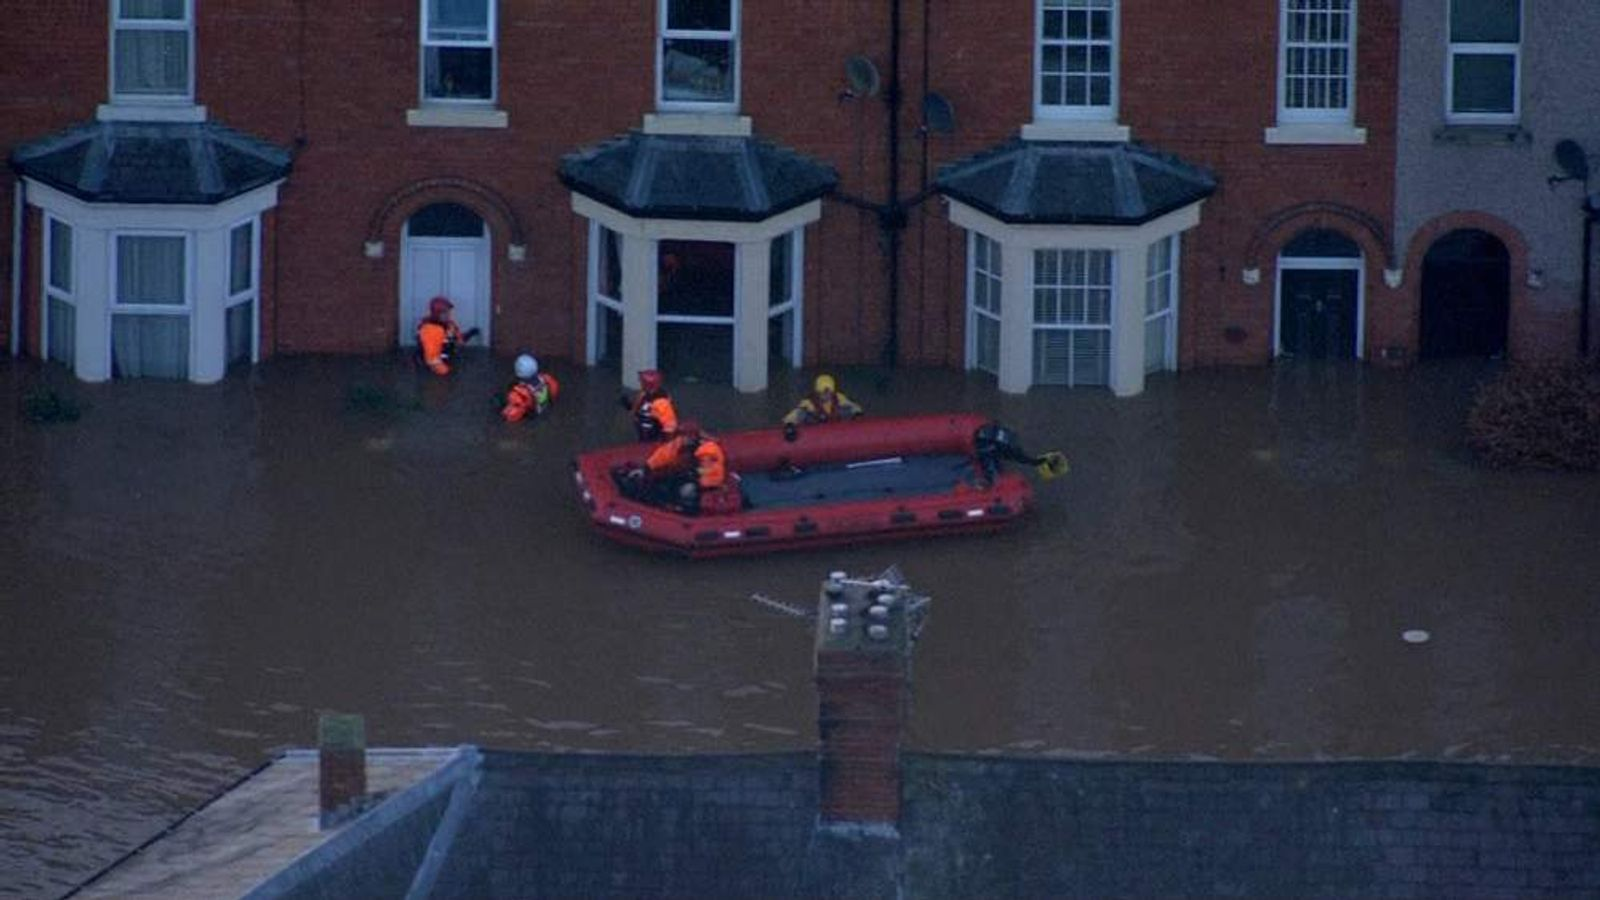 Cumbria Flooding Aerial Shots